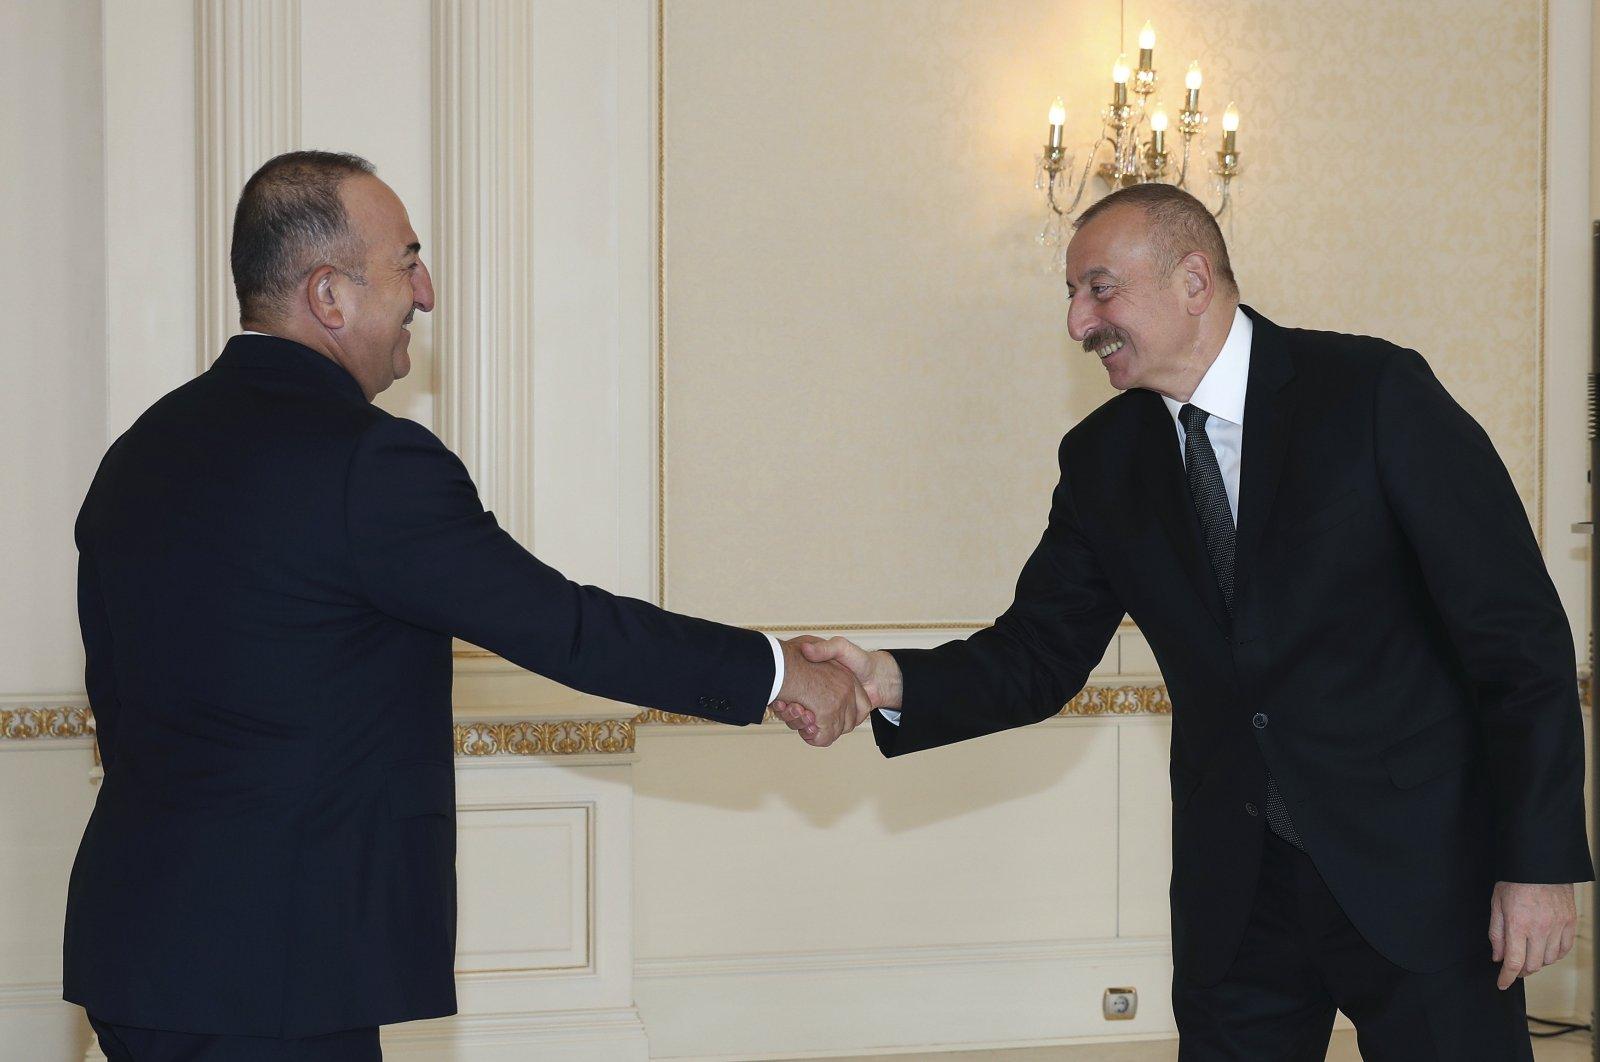 Azerbaijani President Ilham Aliyev (R) and Turkey's Foreign Minister Mevlüt Çavuşoğlu shake hands before a meeting, in Baku, Azerbaijan, Nov. 1, 2020. (AP Photo)